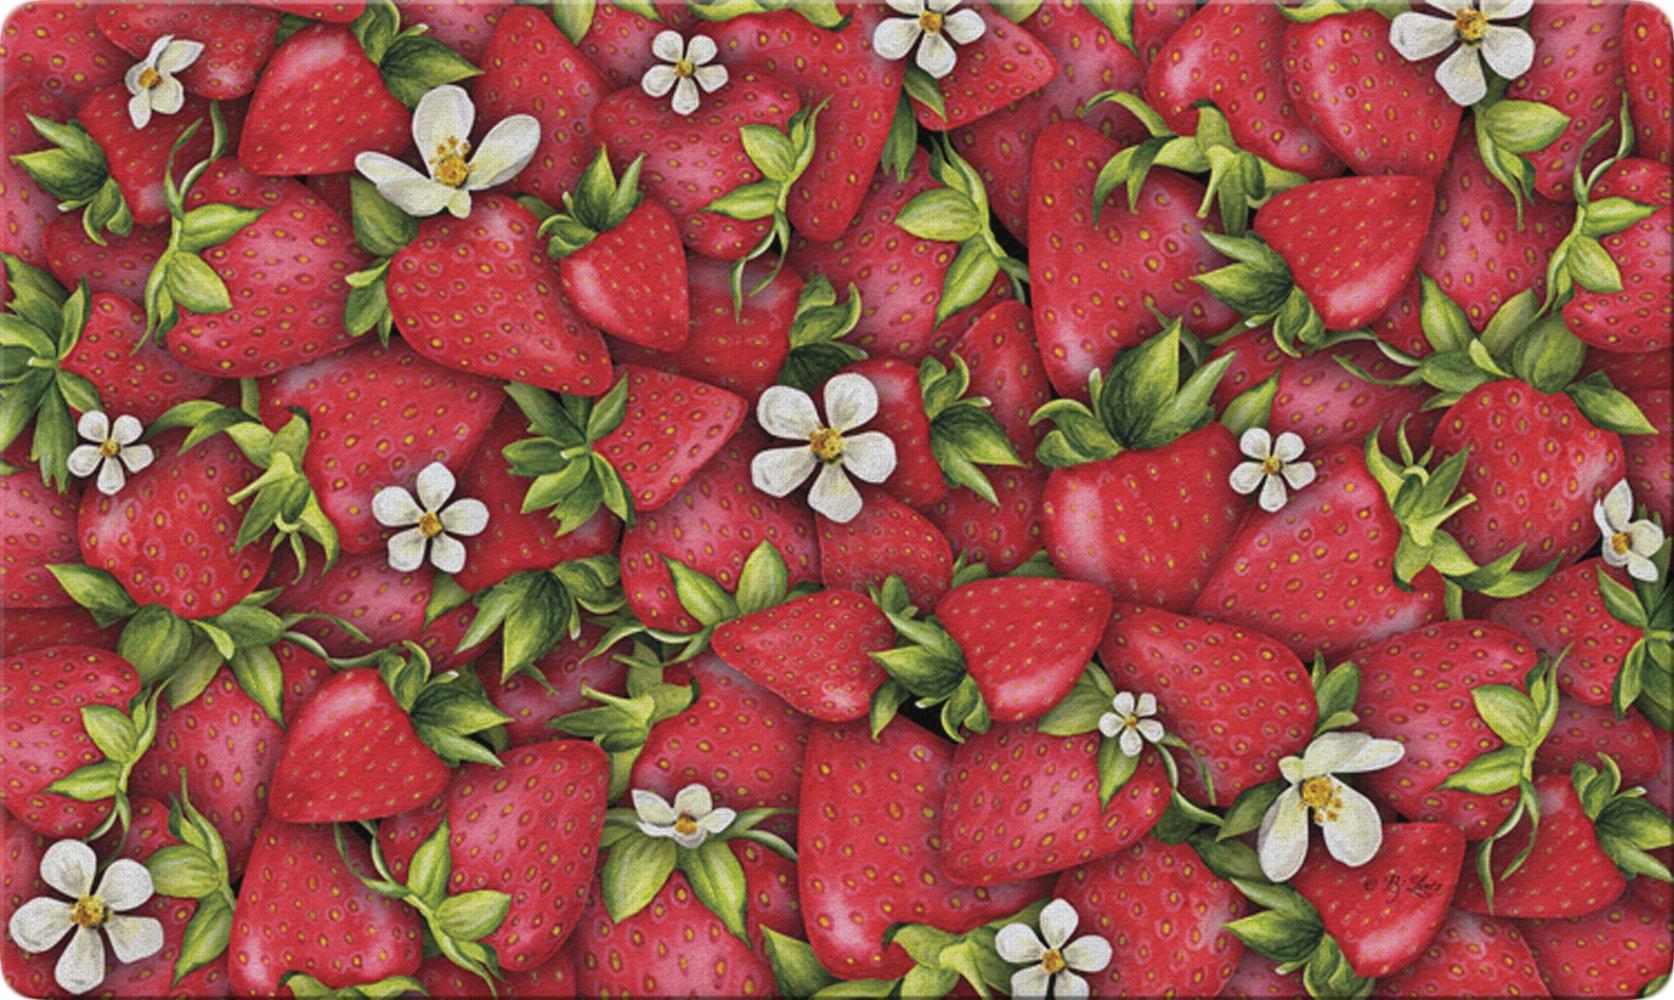 Toland Home Garden Strawberry Collage 18 x 30 Inch Decorative Floor Mat Red Summer Fruit Doormat